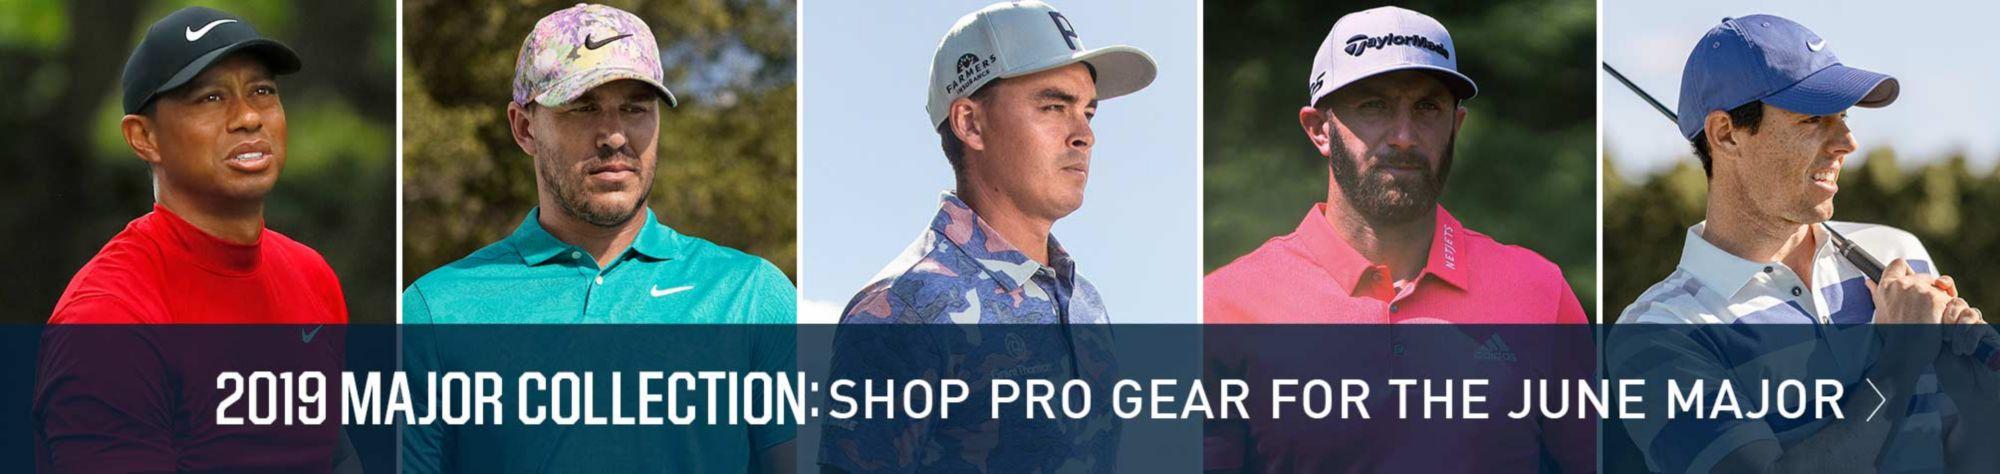 e7b77187 Golf Shirts for Men, Women, Boys & Girls | Best Price Guarantee at ...